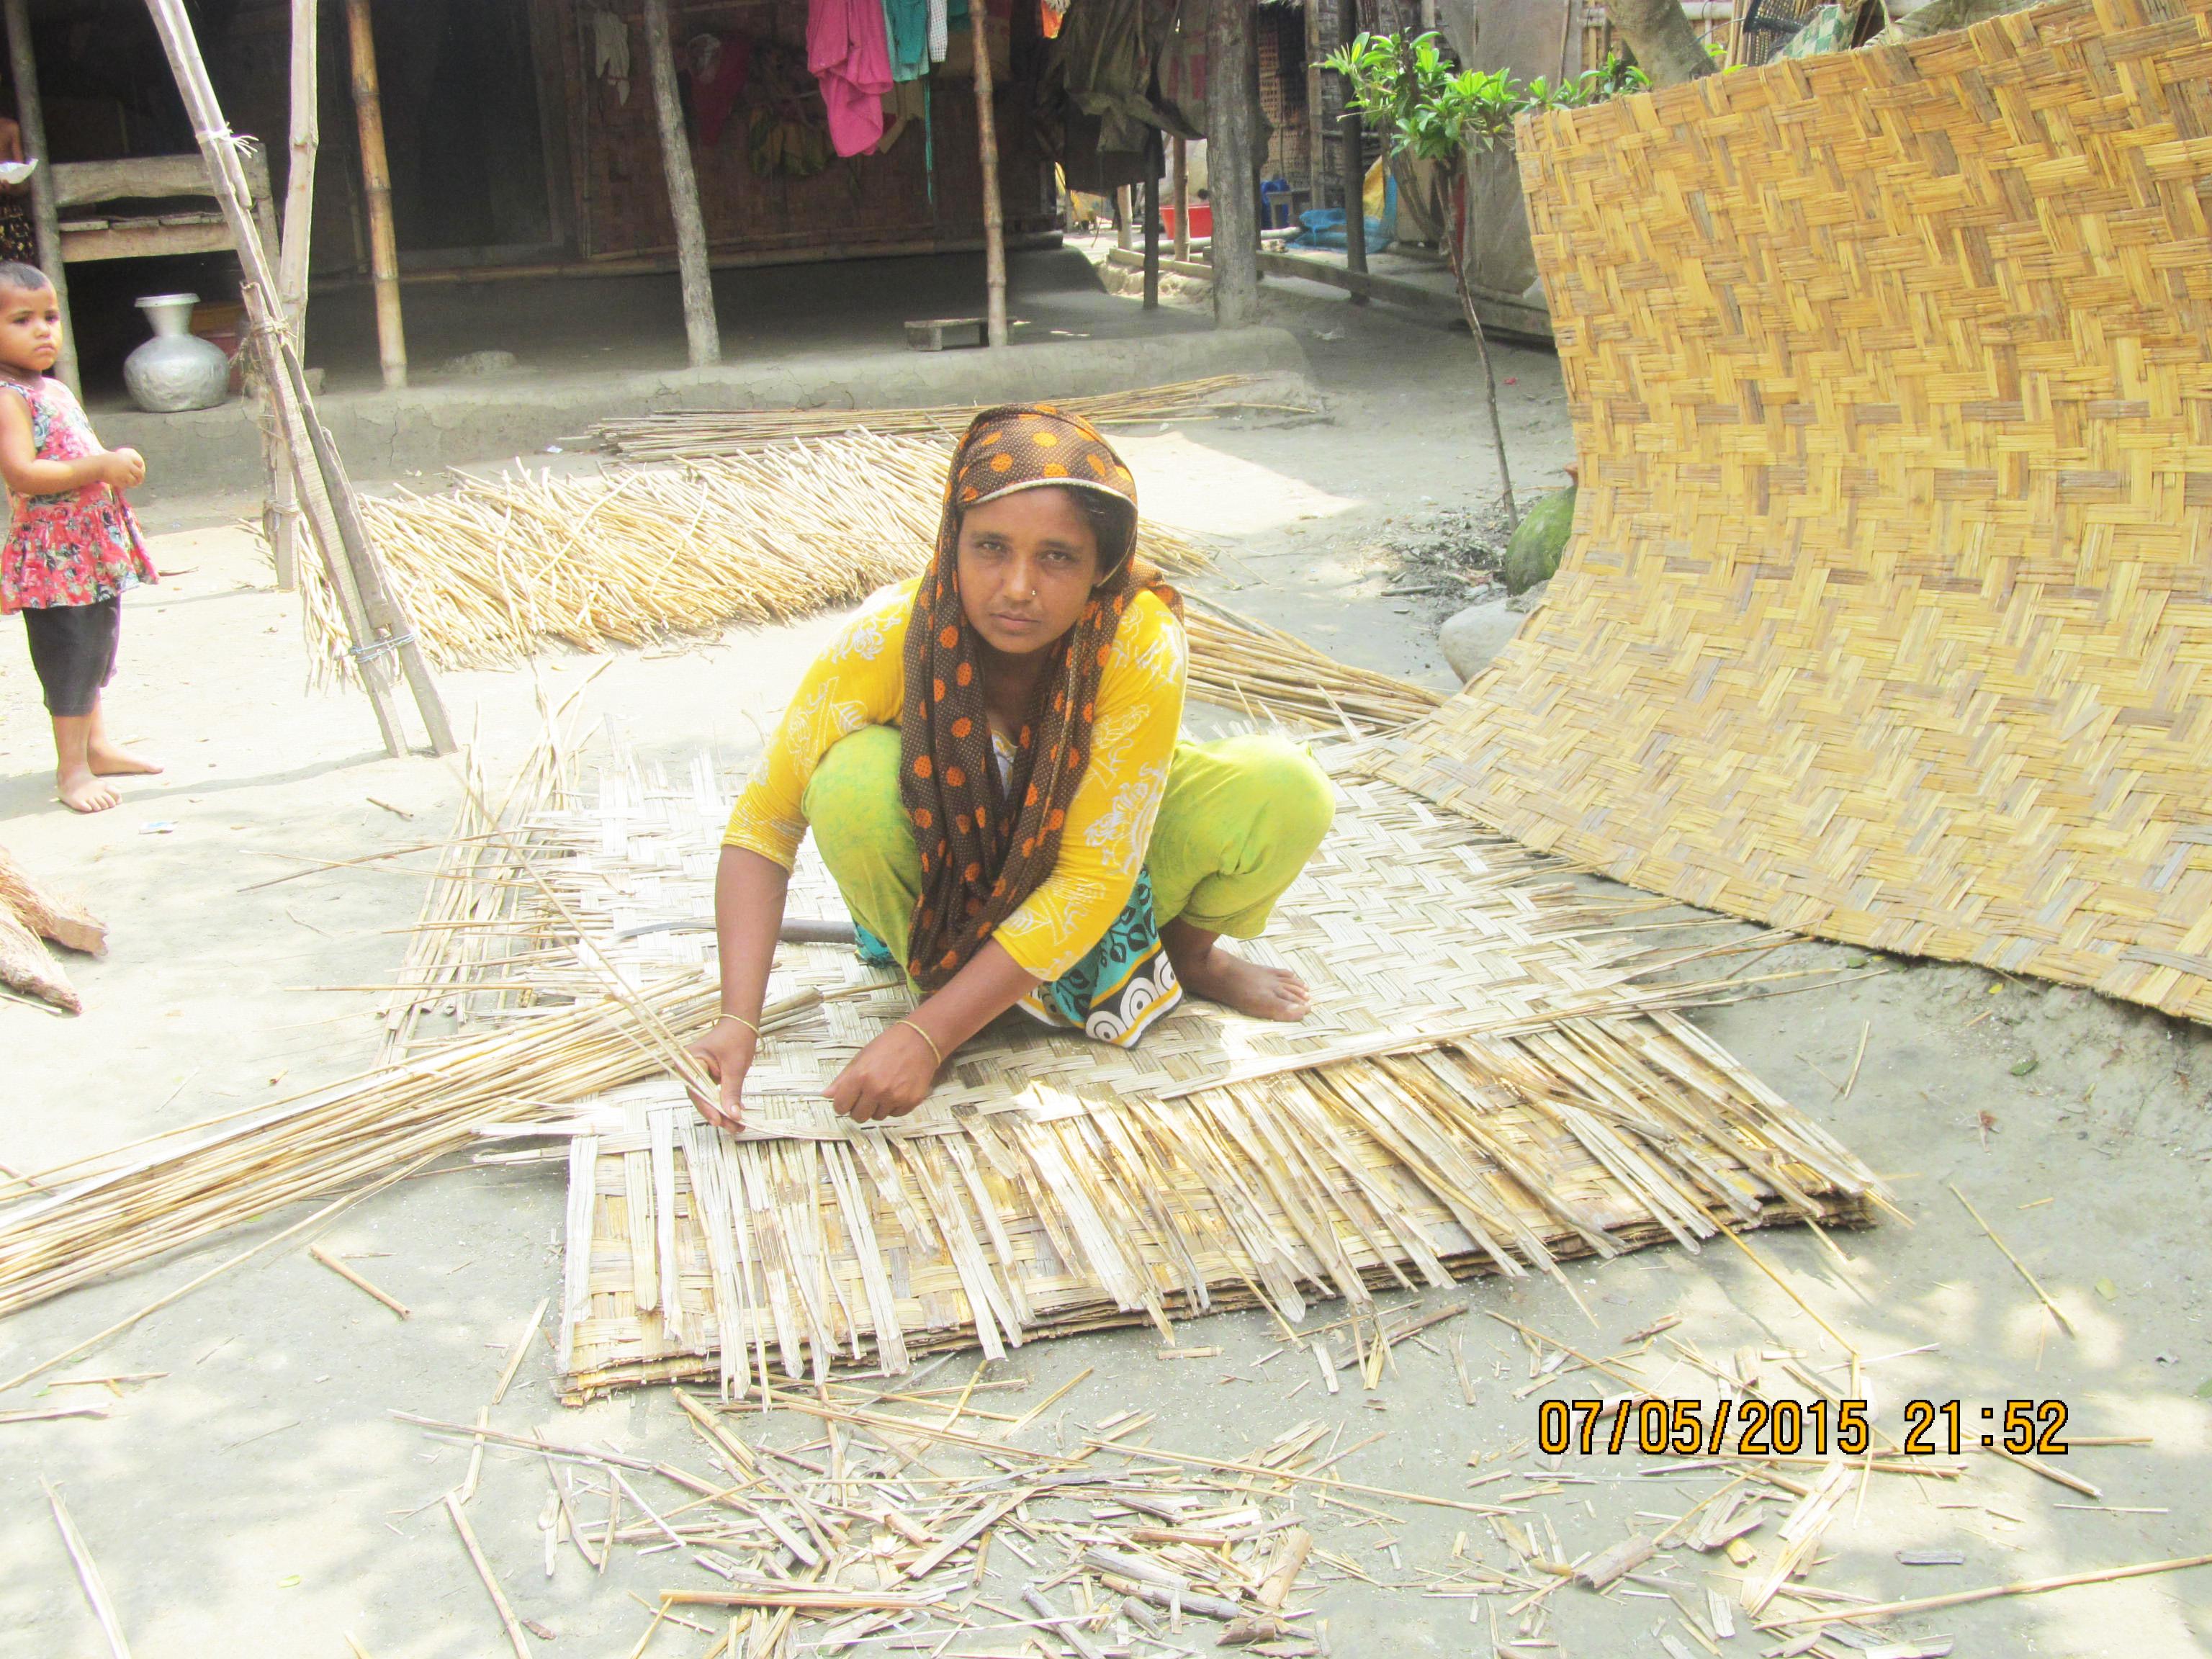 Mat Making  By Hogla, Mahfuza Begum, Nolopara W.S. Dacope, Khulna